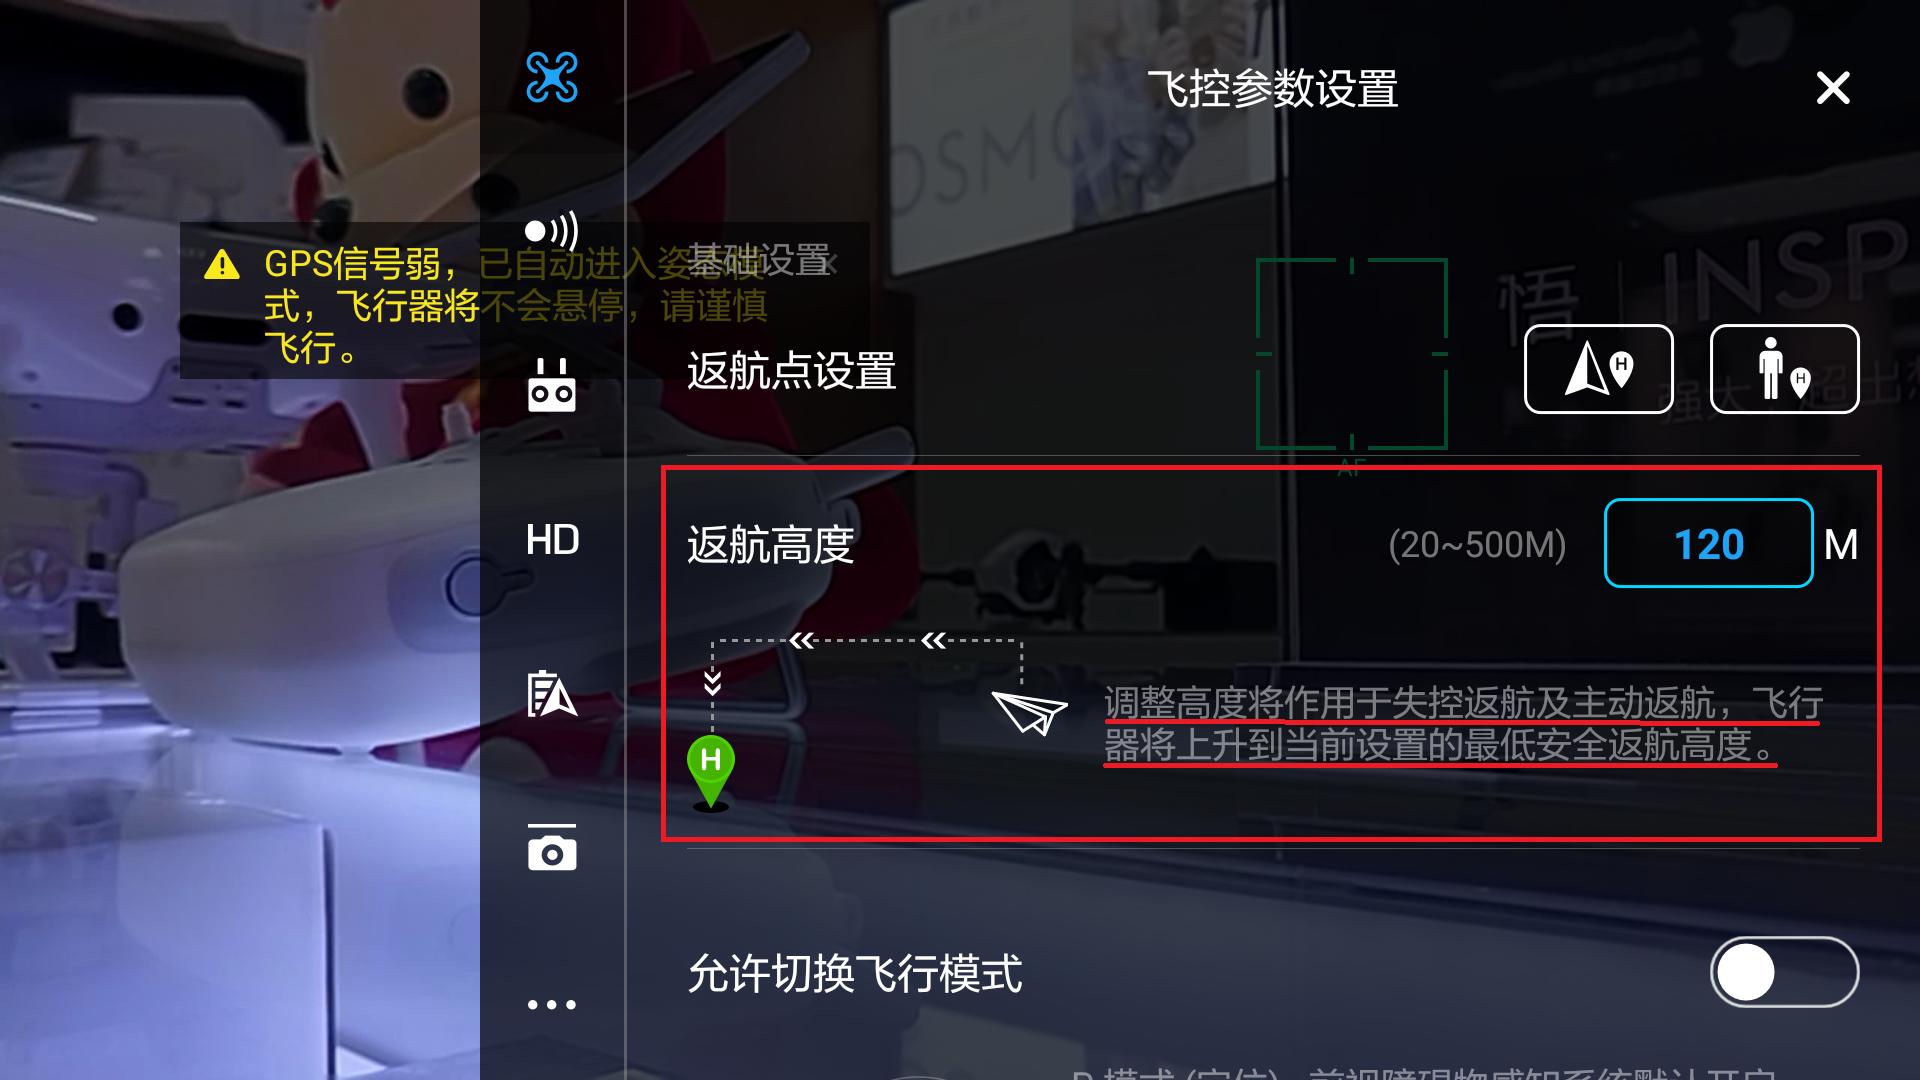 Screenshot_2017-01-22-14-24-18.png